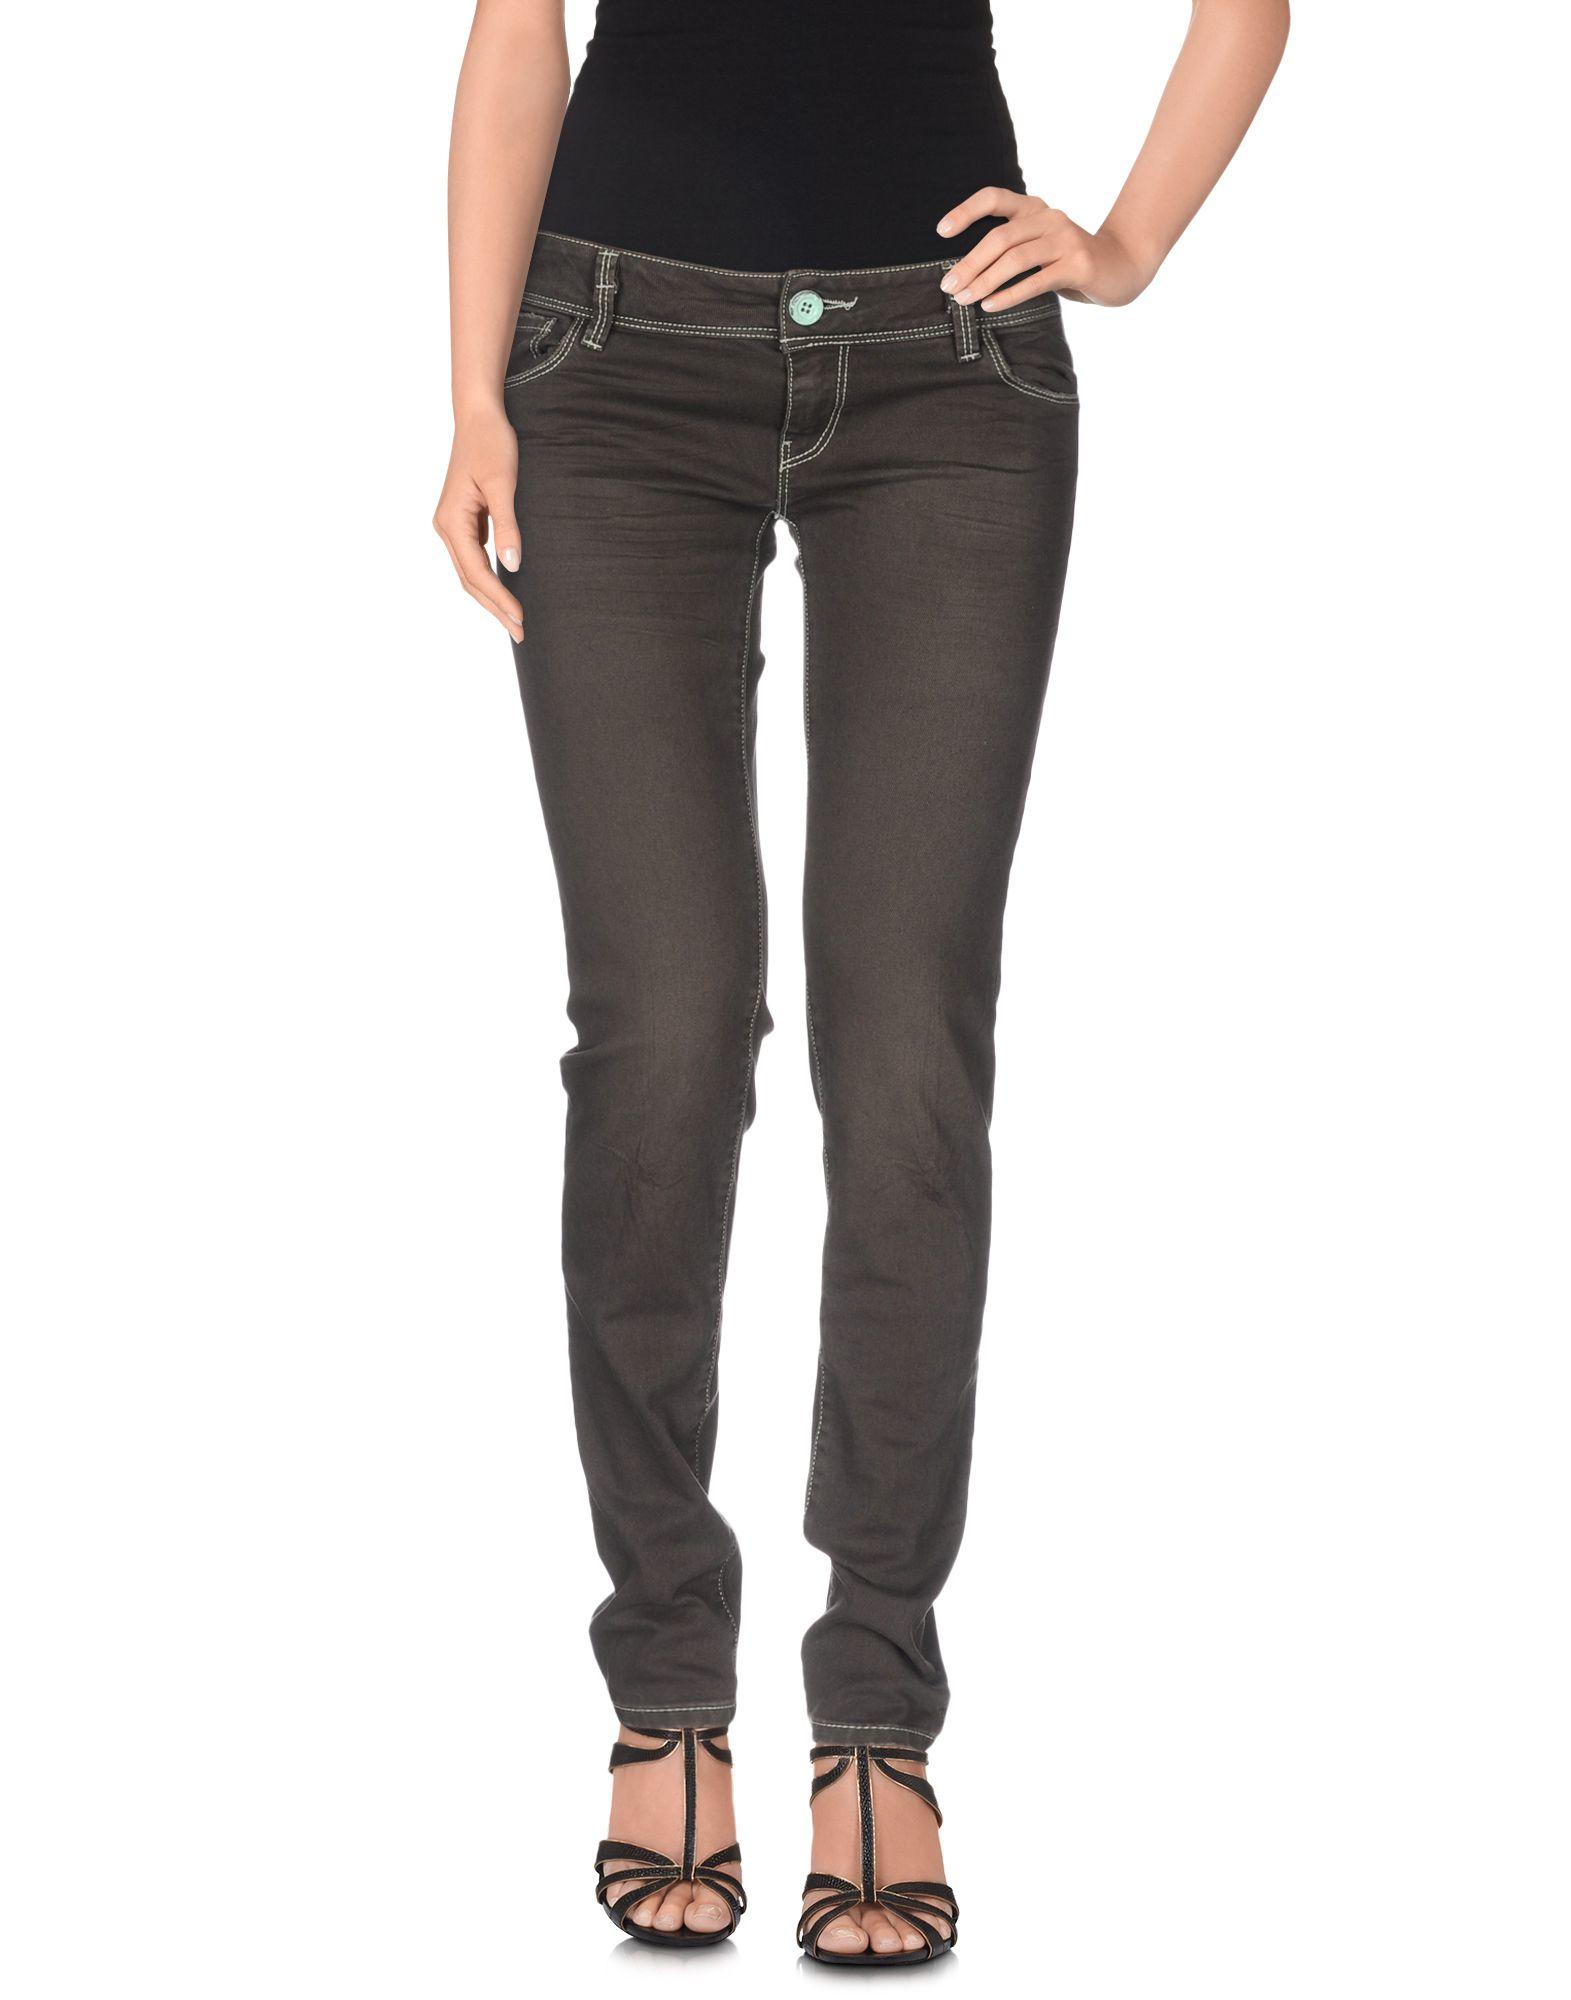 Dark Brown Jeans Womens - Jeans Am